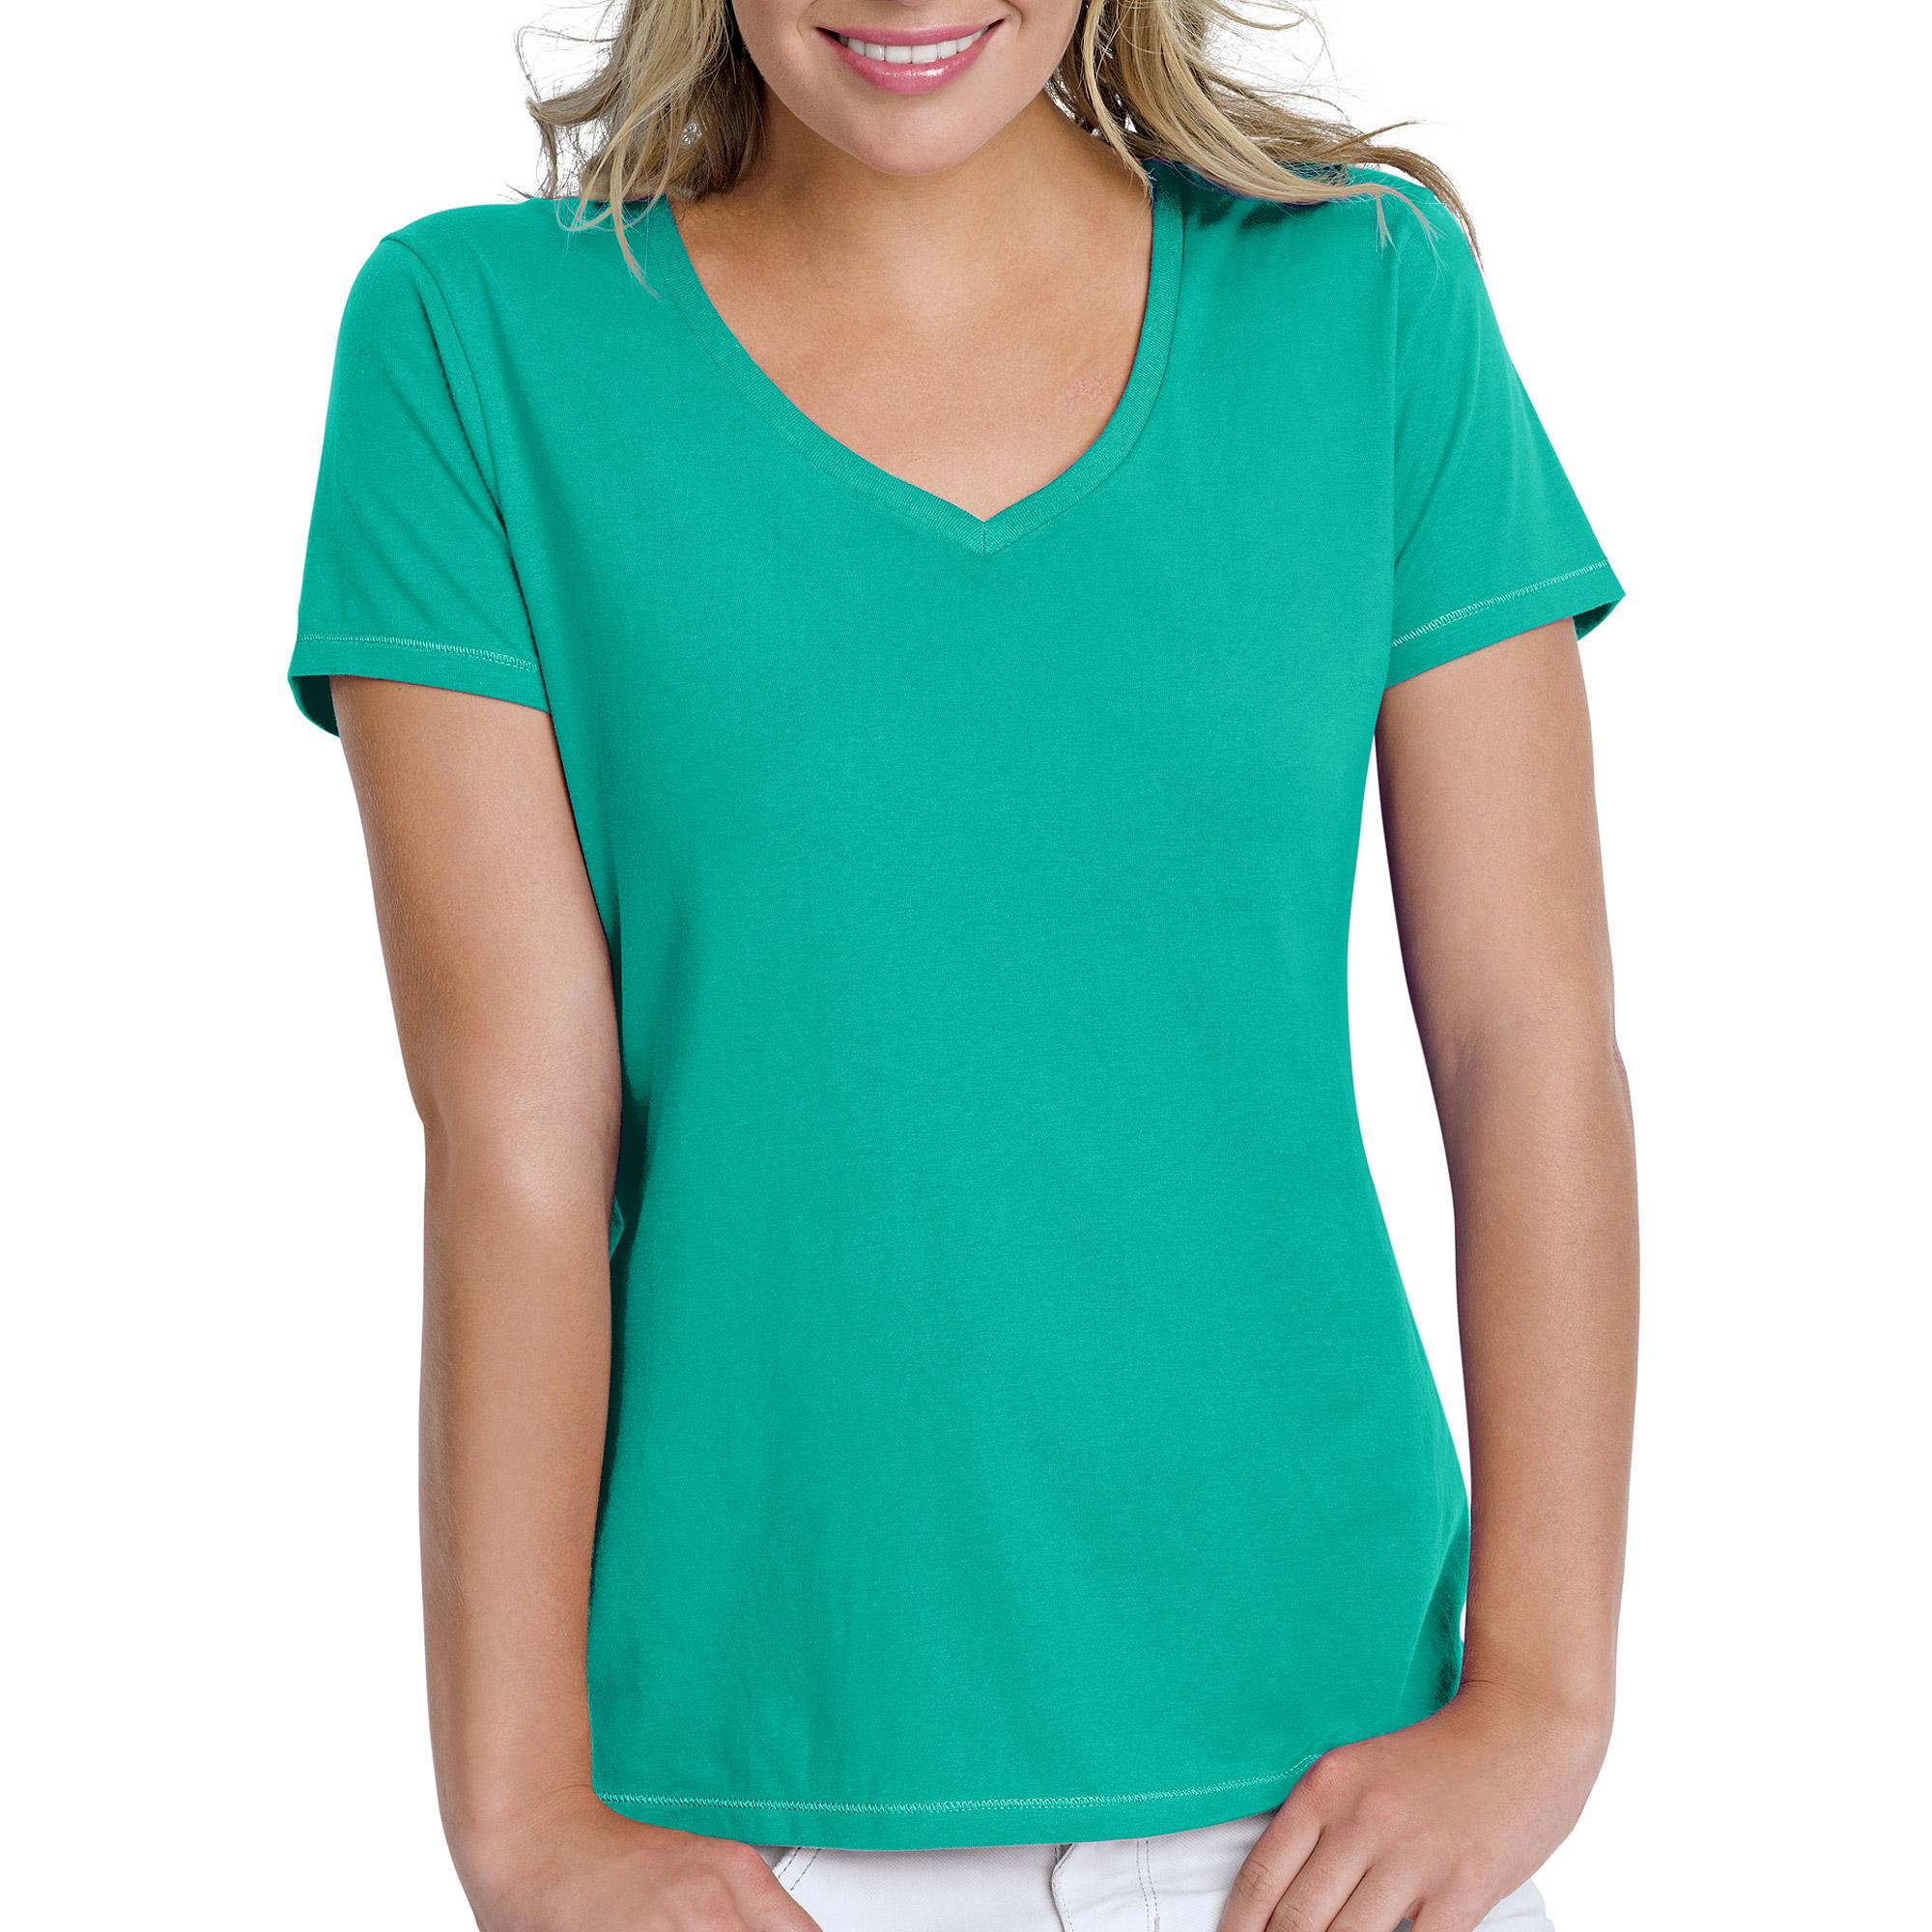 Hanes Women's  Essential Short-Sleeve V-neck T-Shirt